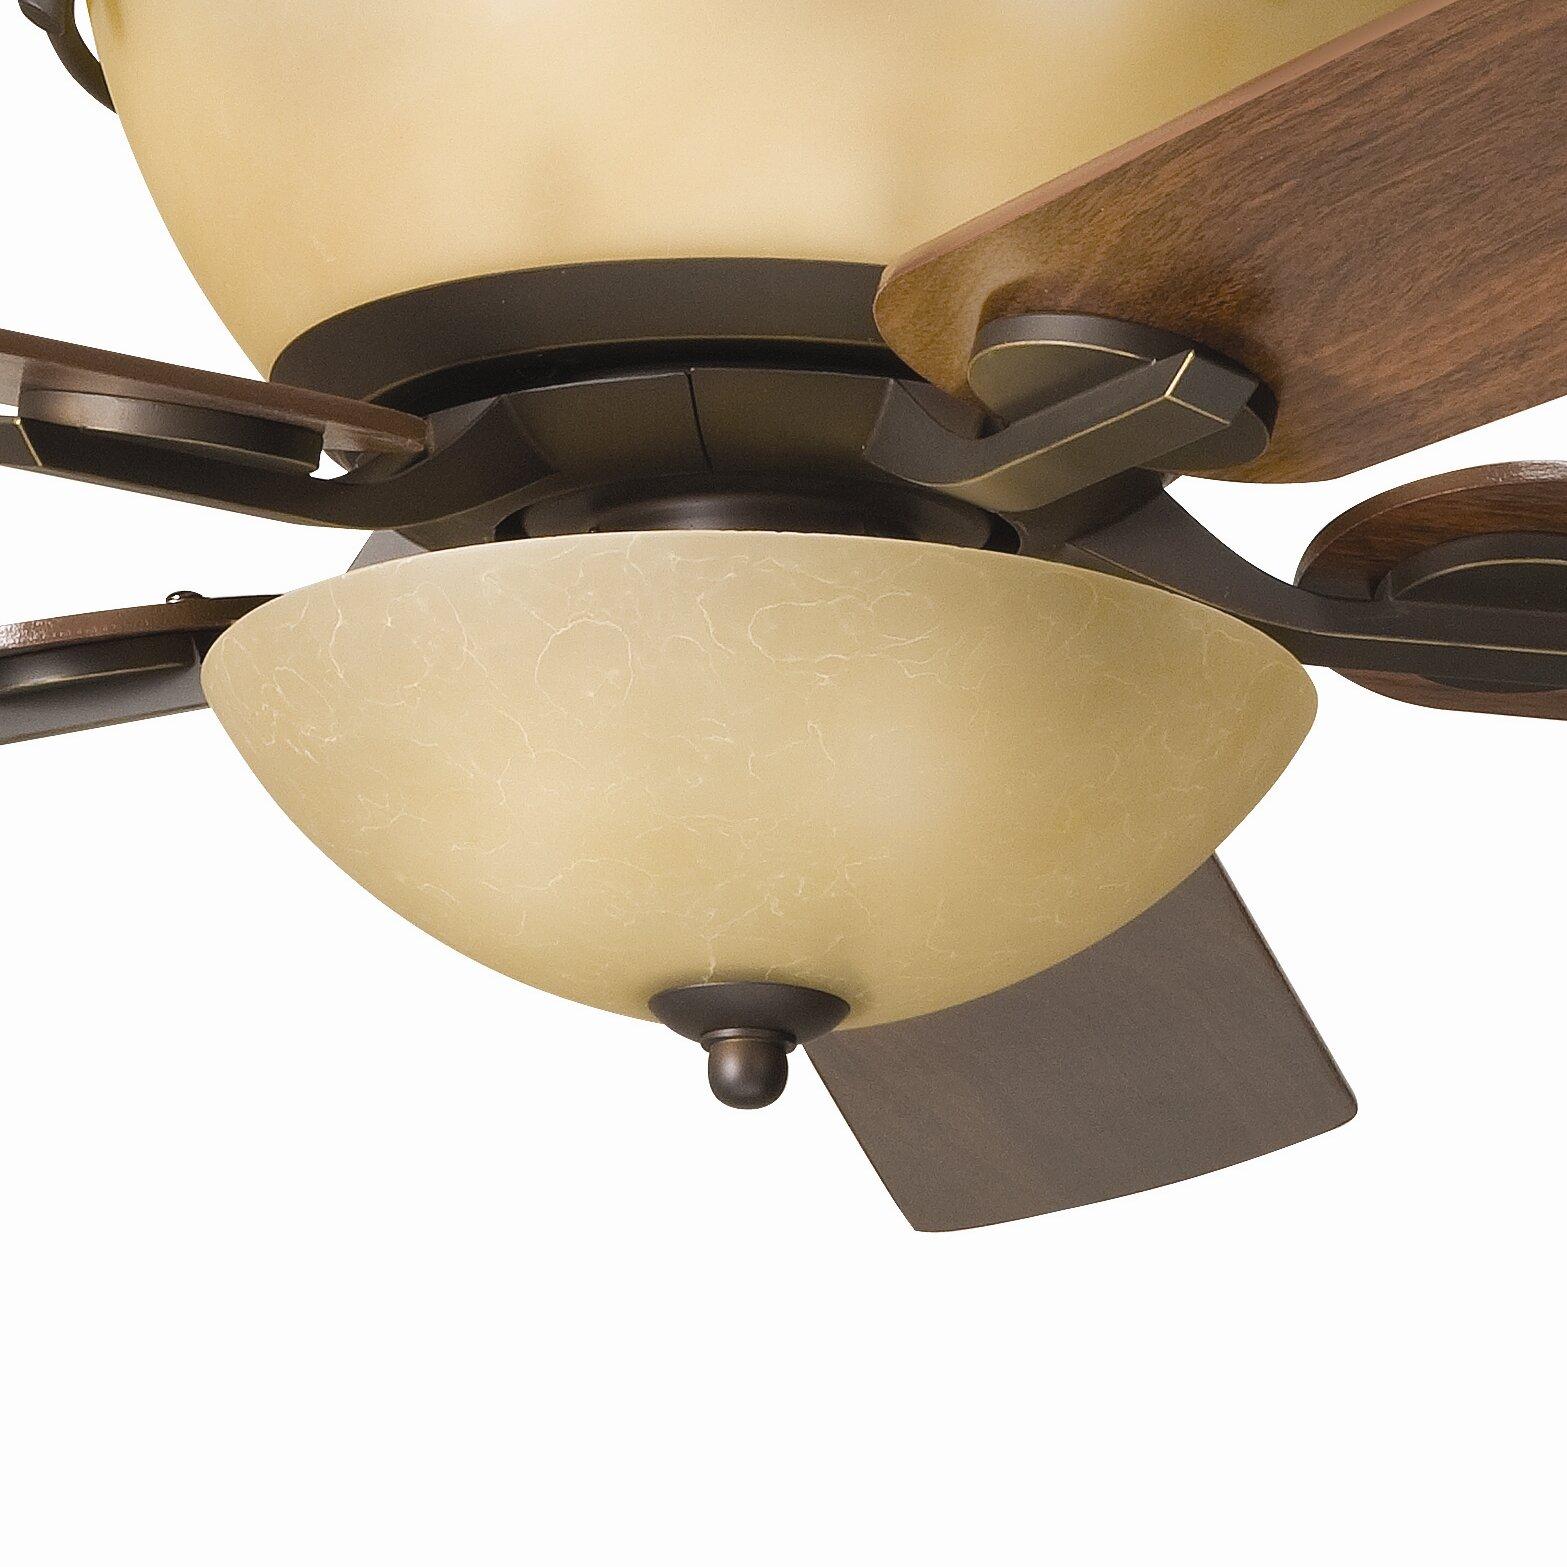 Kichler Olympia 3 Light Bowl Ceiling Fan Light Kit